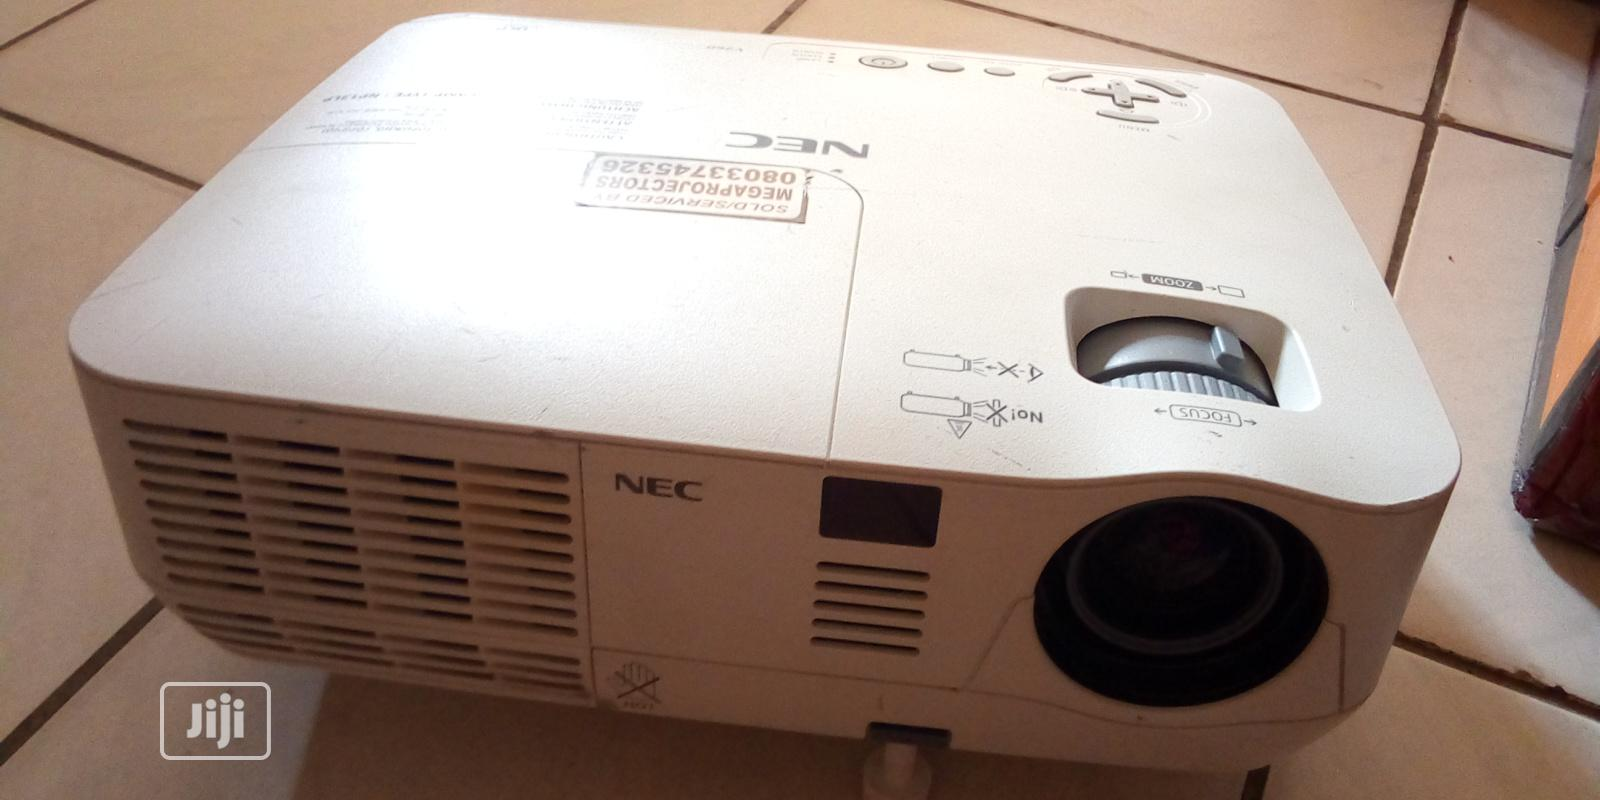 NEC Projector V260 | TV & DVD Equipment for sale in Ijebu Ode, Ogun State, Nigeria